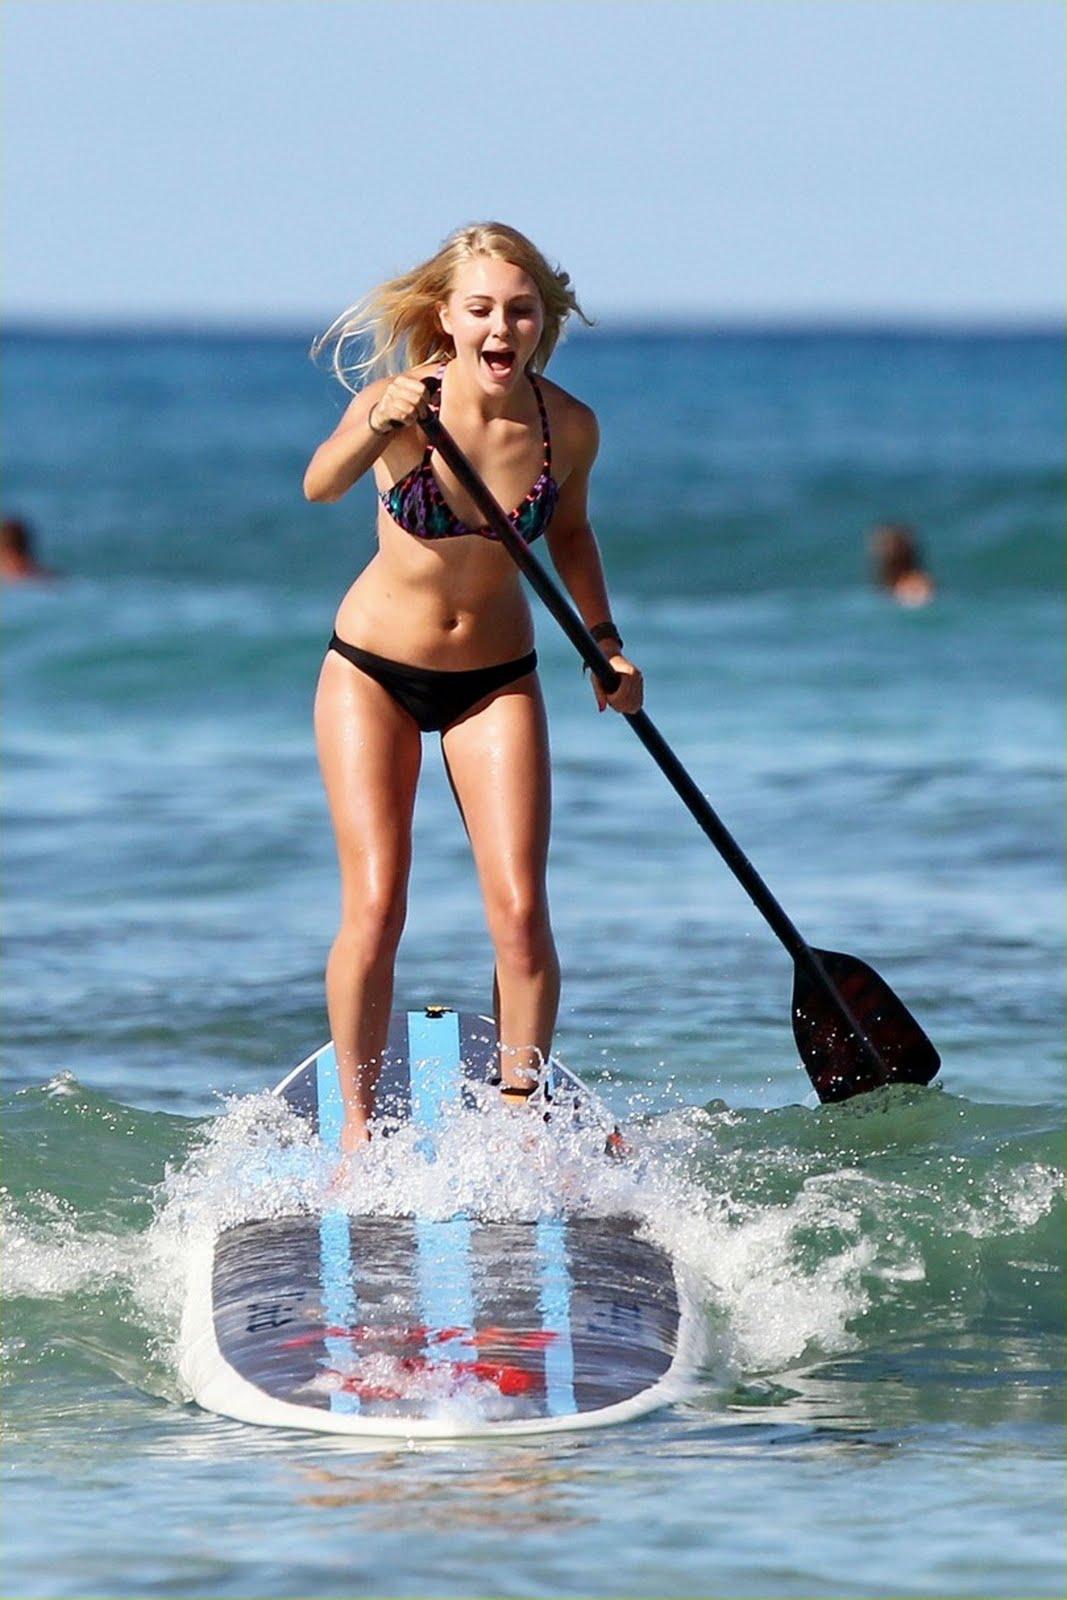 Sexiest Women In Bikinis: AnnaSophia Robb